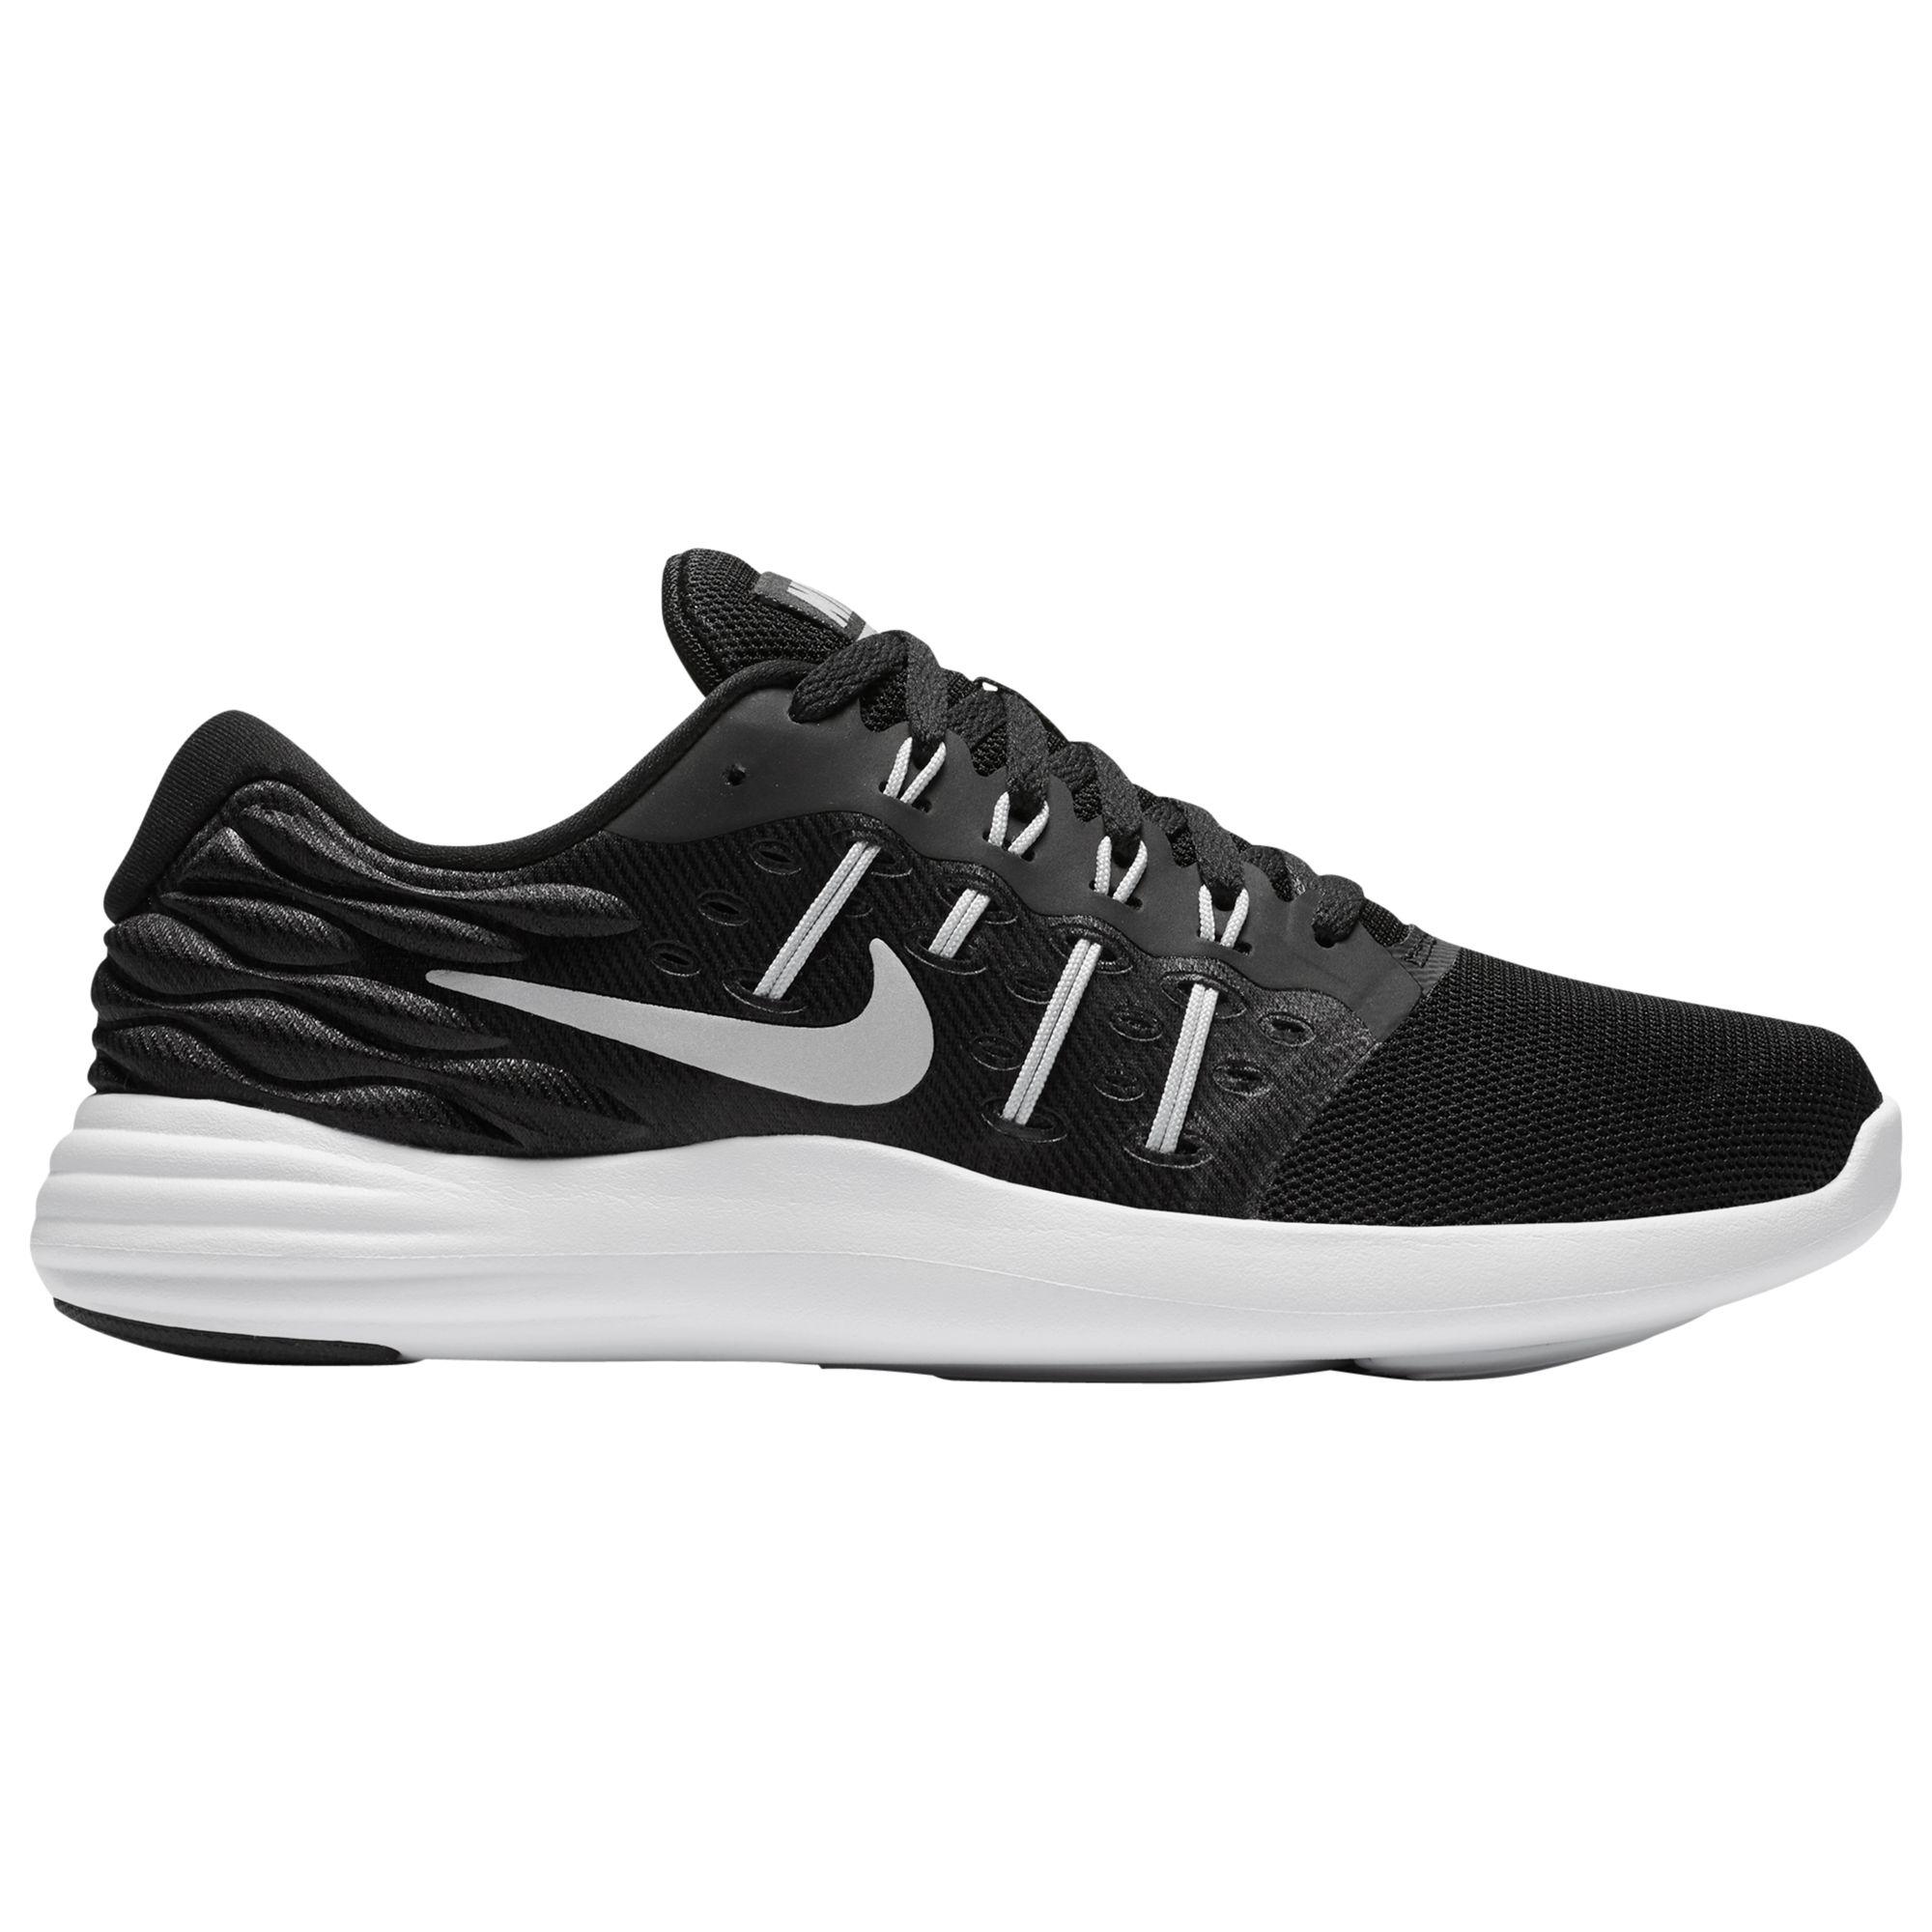 126cac5e9f9 Nike LunarStelos Women s Running Shoes at John Lewis   Partners